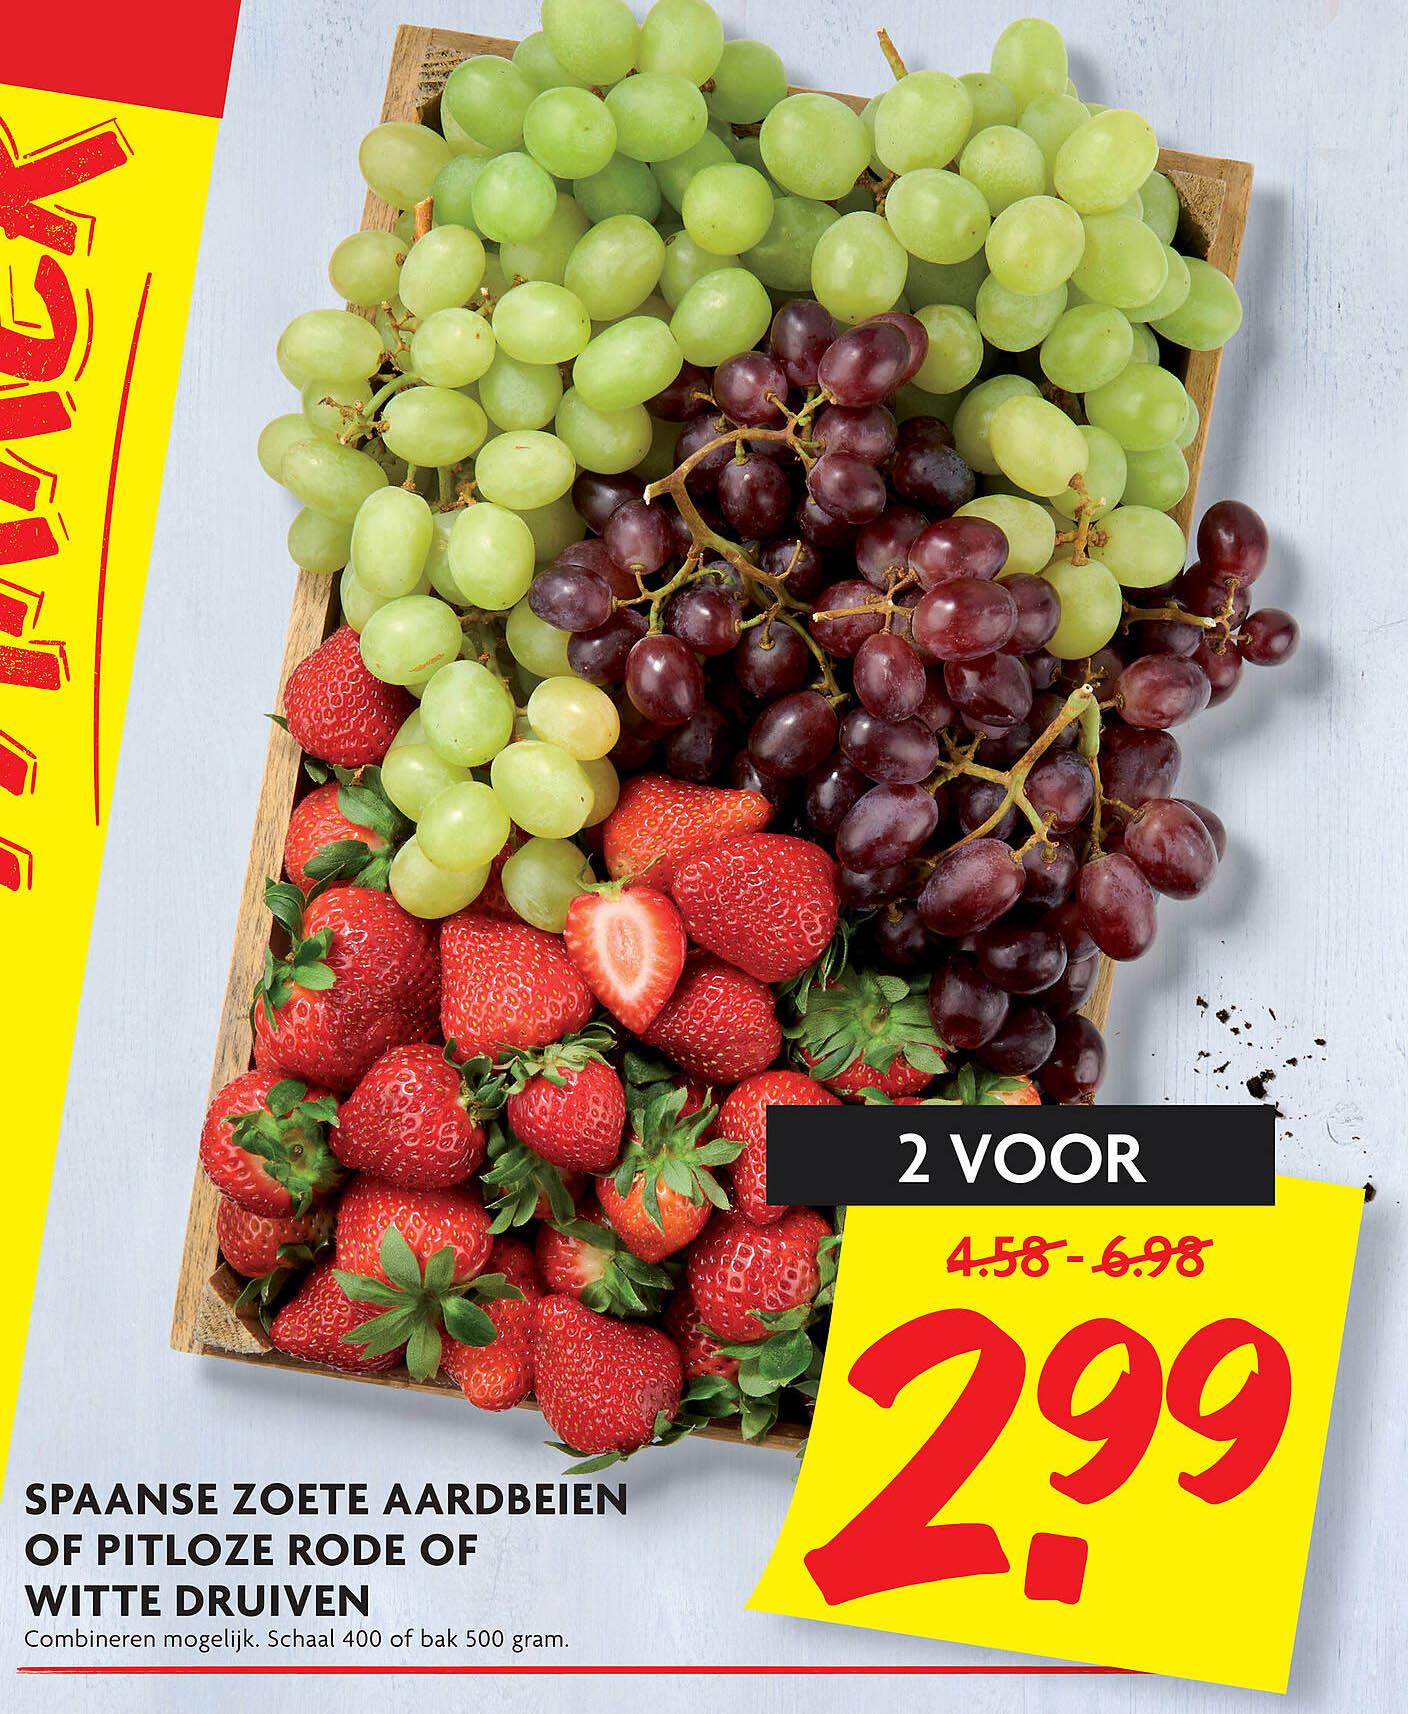 DekaMarkt Spaanse Zoete Aardeien Of Pitloze Rode Of Witte Druiven